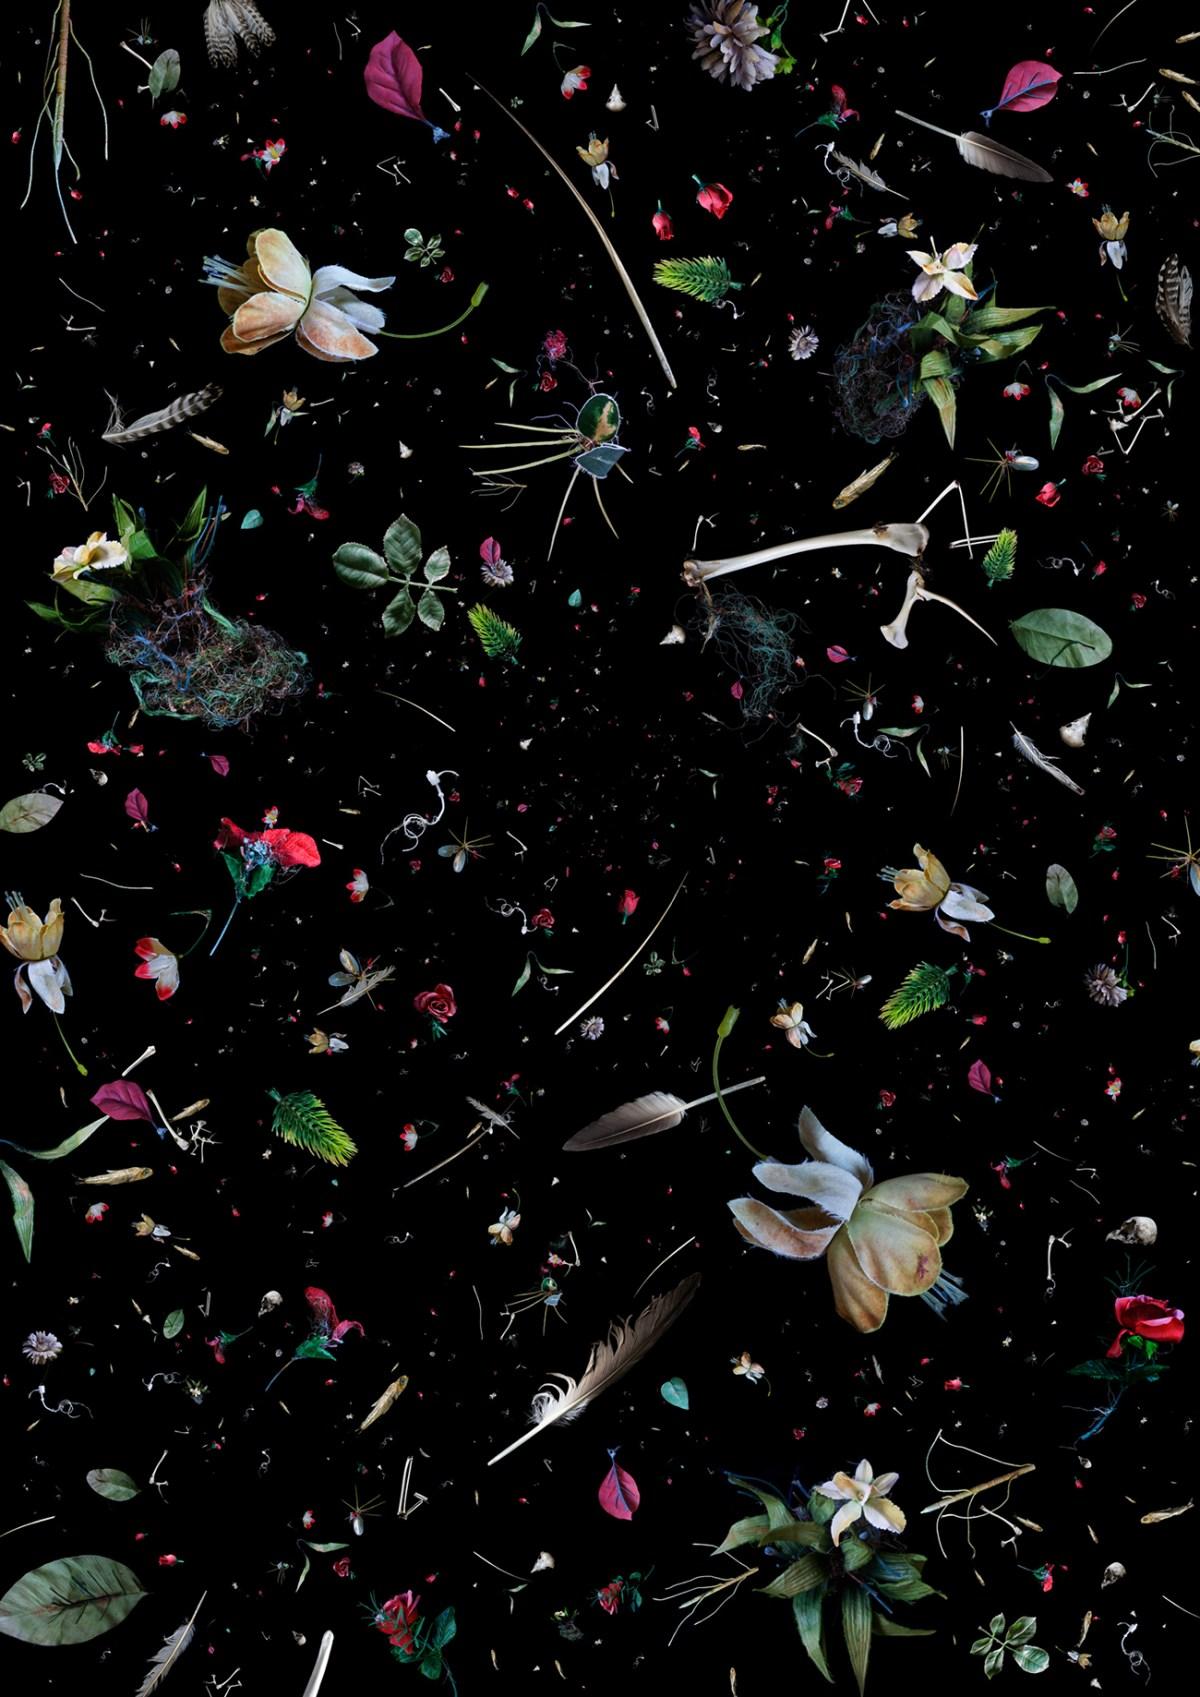 SOUP series (2011) - marine plastic debris